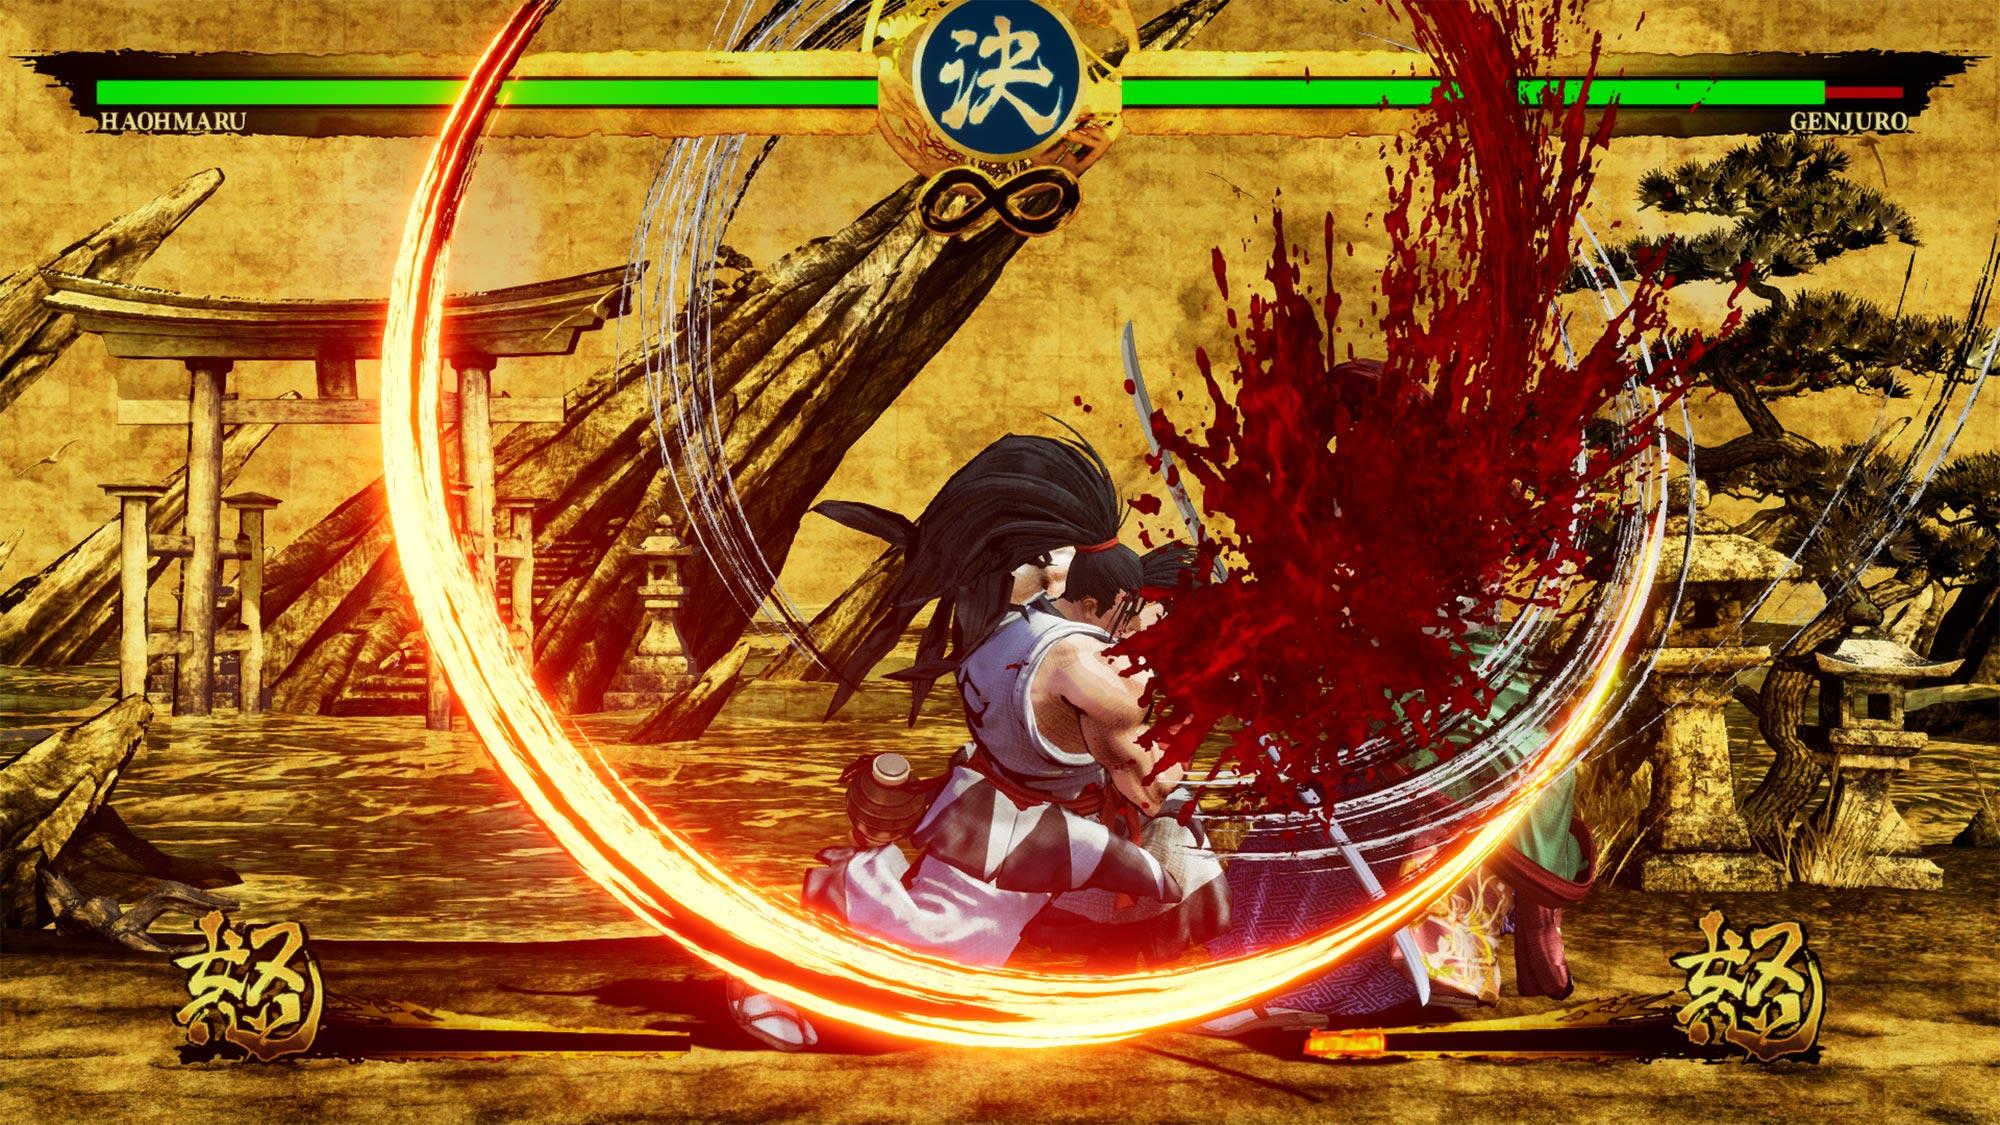 Samurai Shodown screenshots 10 out of 11 image gallery